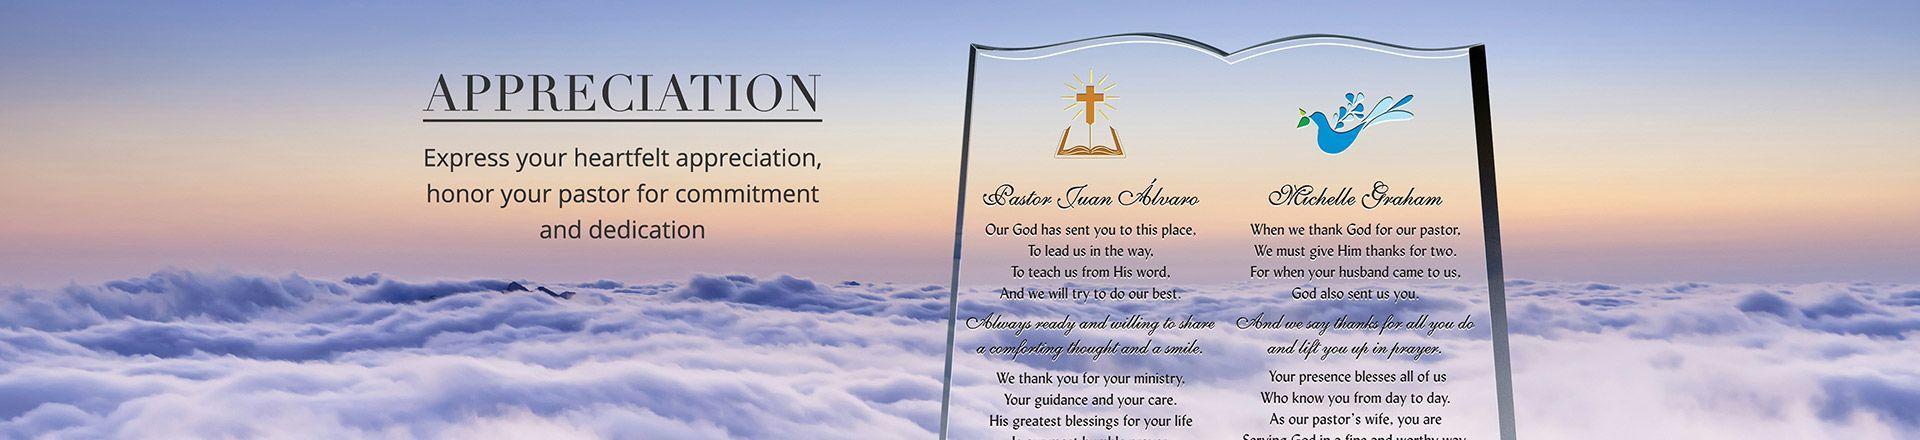 Pastor Appreciation Poems Scriptures and Quotes DIY Awards